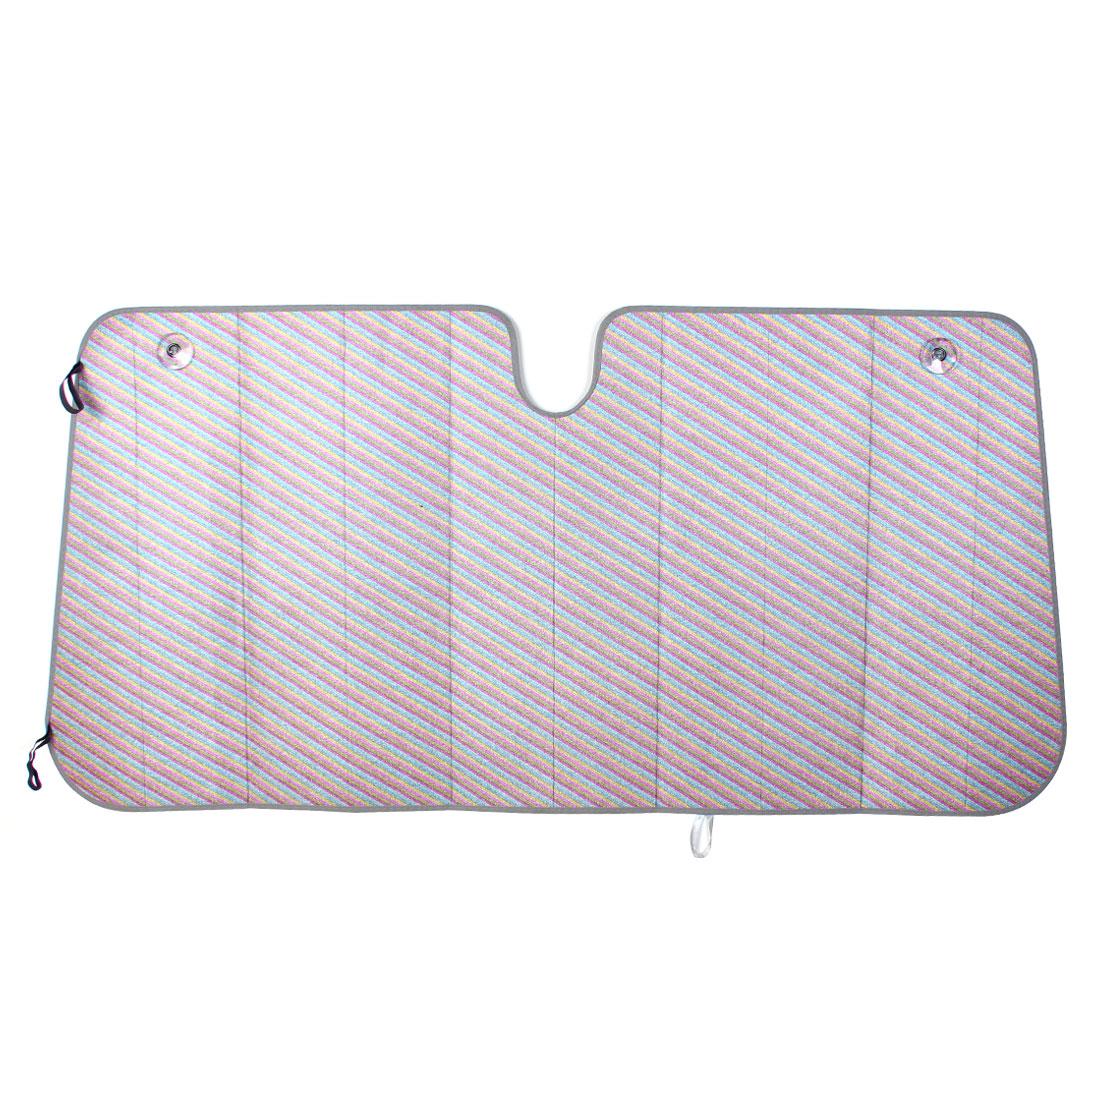 Colorful Foldable Car Window Windshield Sun Shade Visor Shield Cover 142 x 70cm